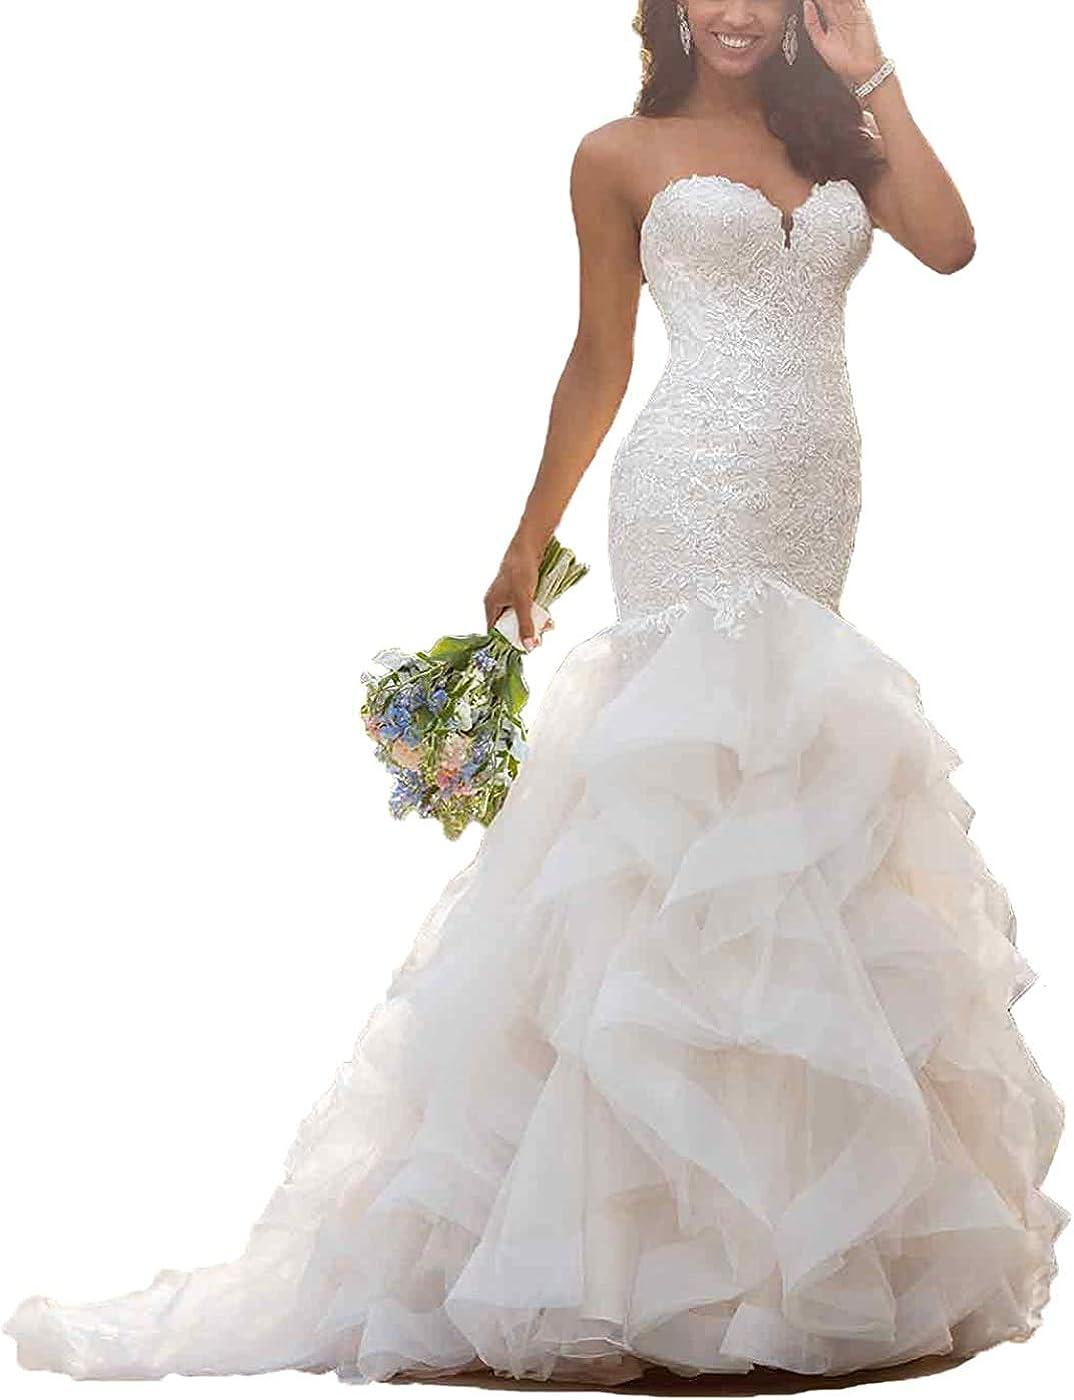 Wanshaqin Mermaid Wedding Dress Bridal Dress Lace Up Corset